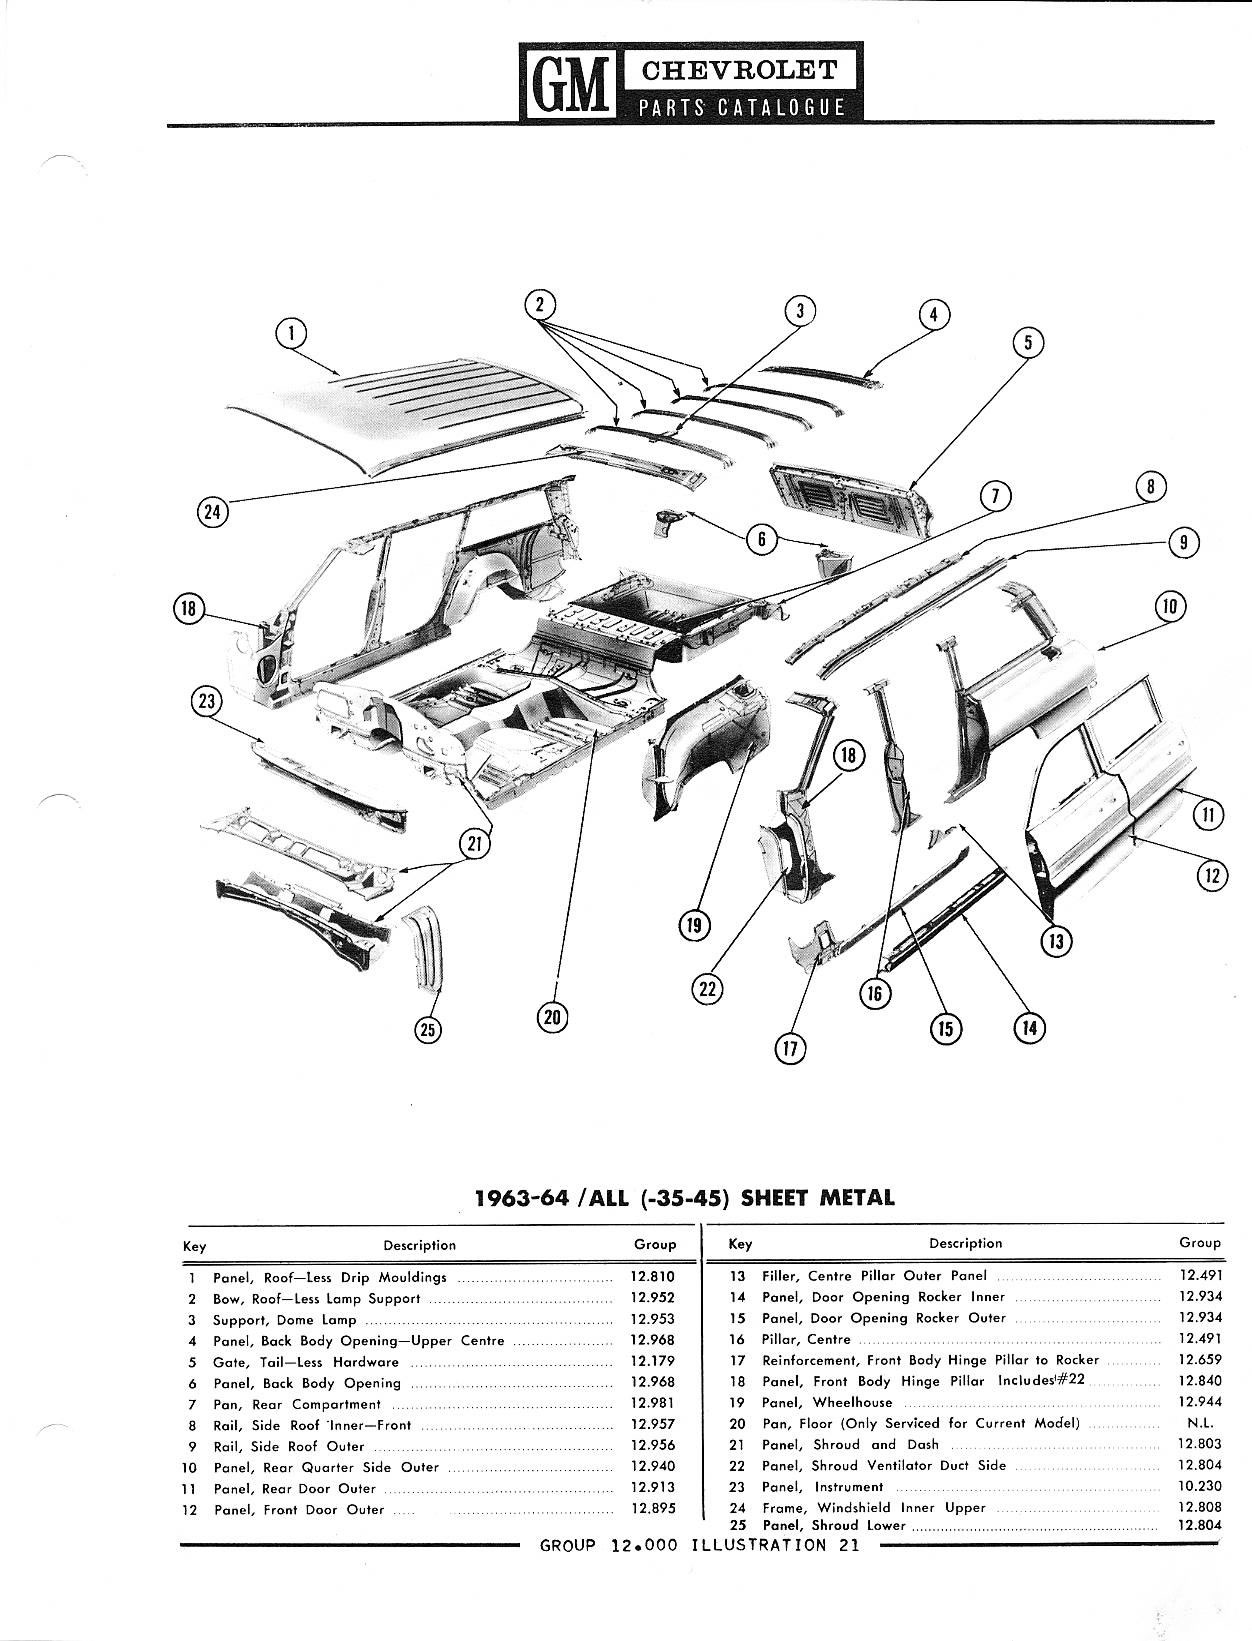 1958-1968 Chevrolet Parts Catalog / Image177.jpg